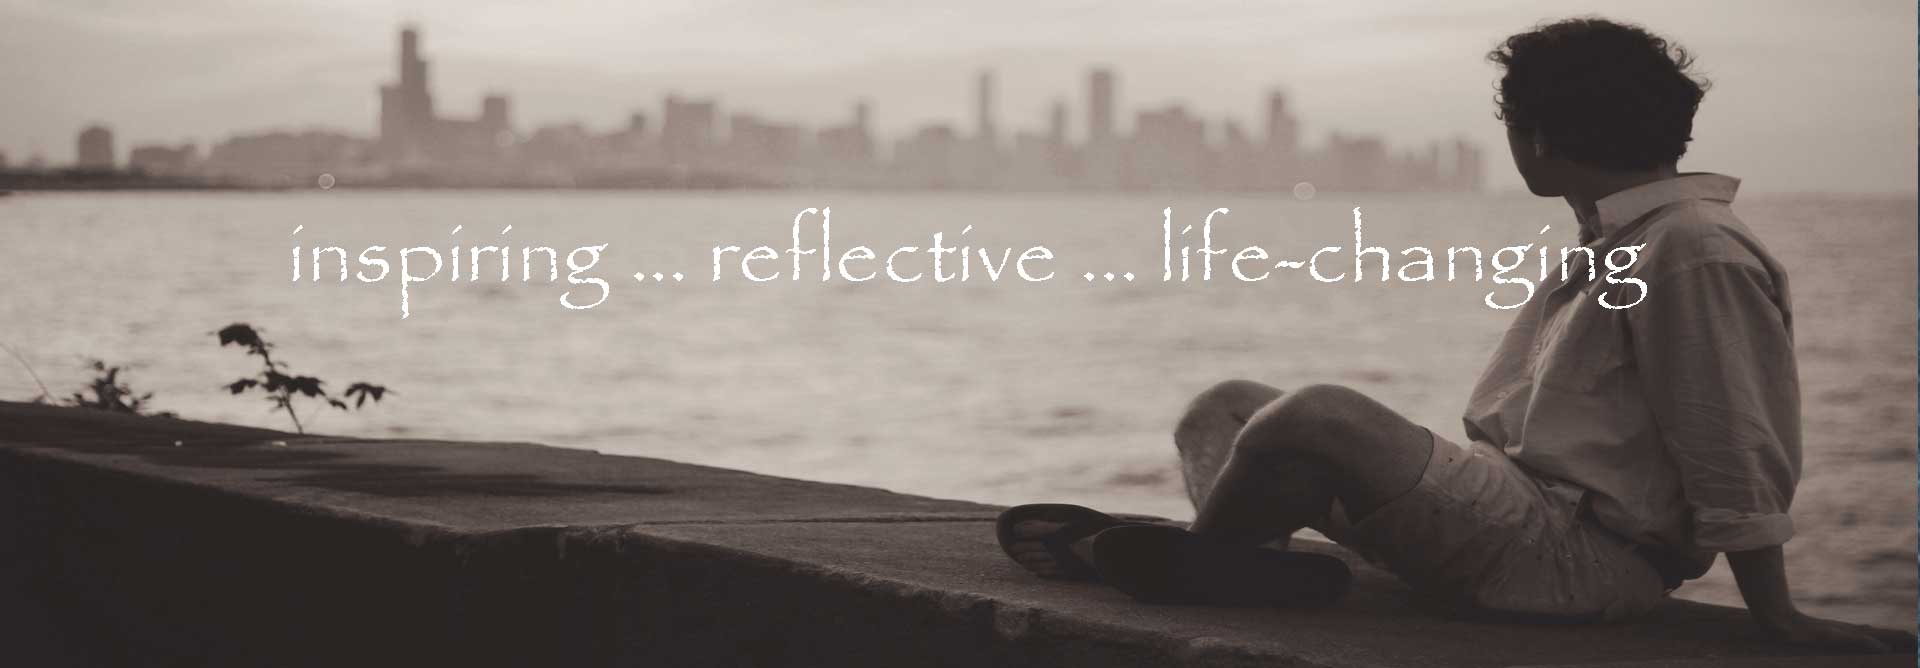 Inspiring Reflective Life Changing